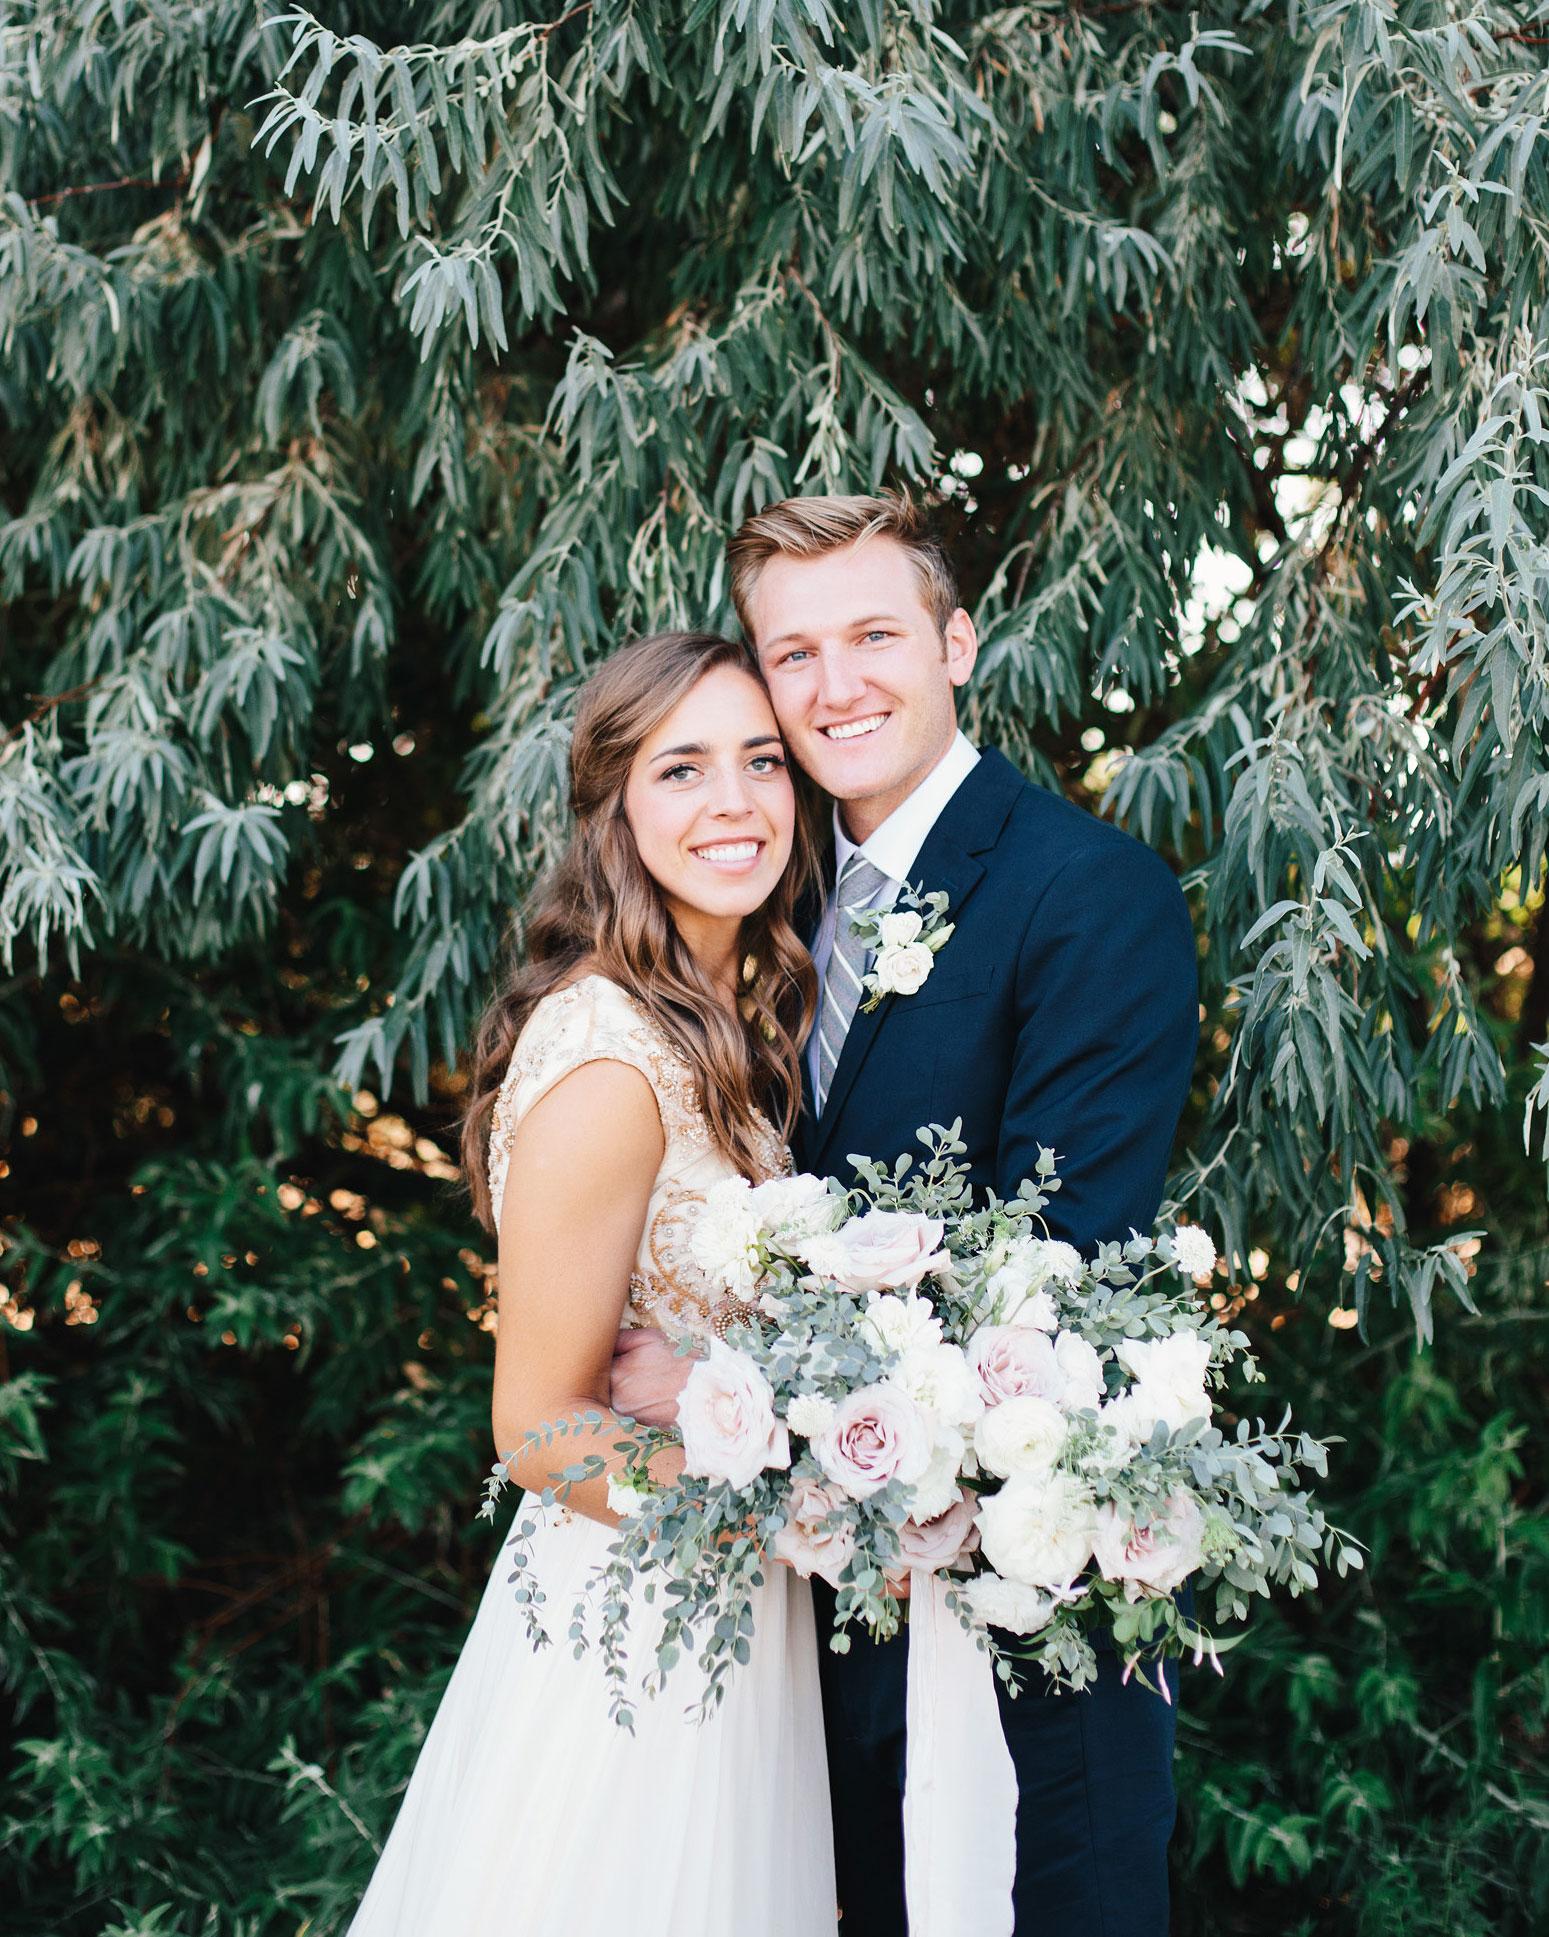 mackenzie-boman-wedding-couple-169-s112693-0316.jpg